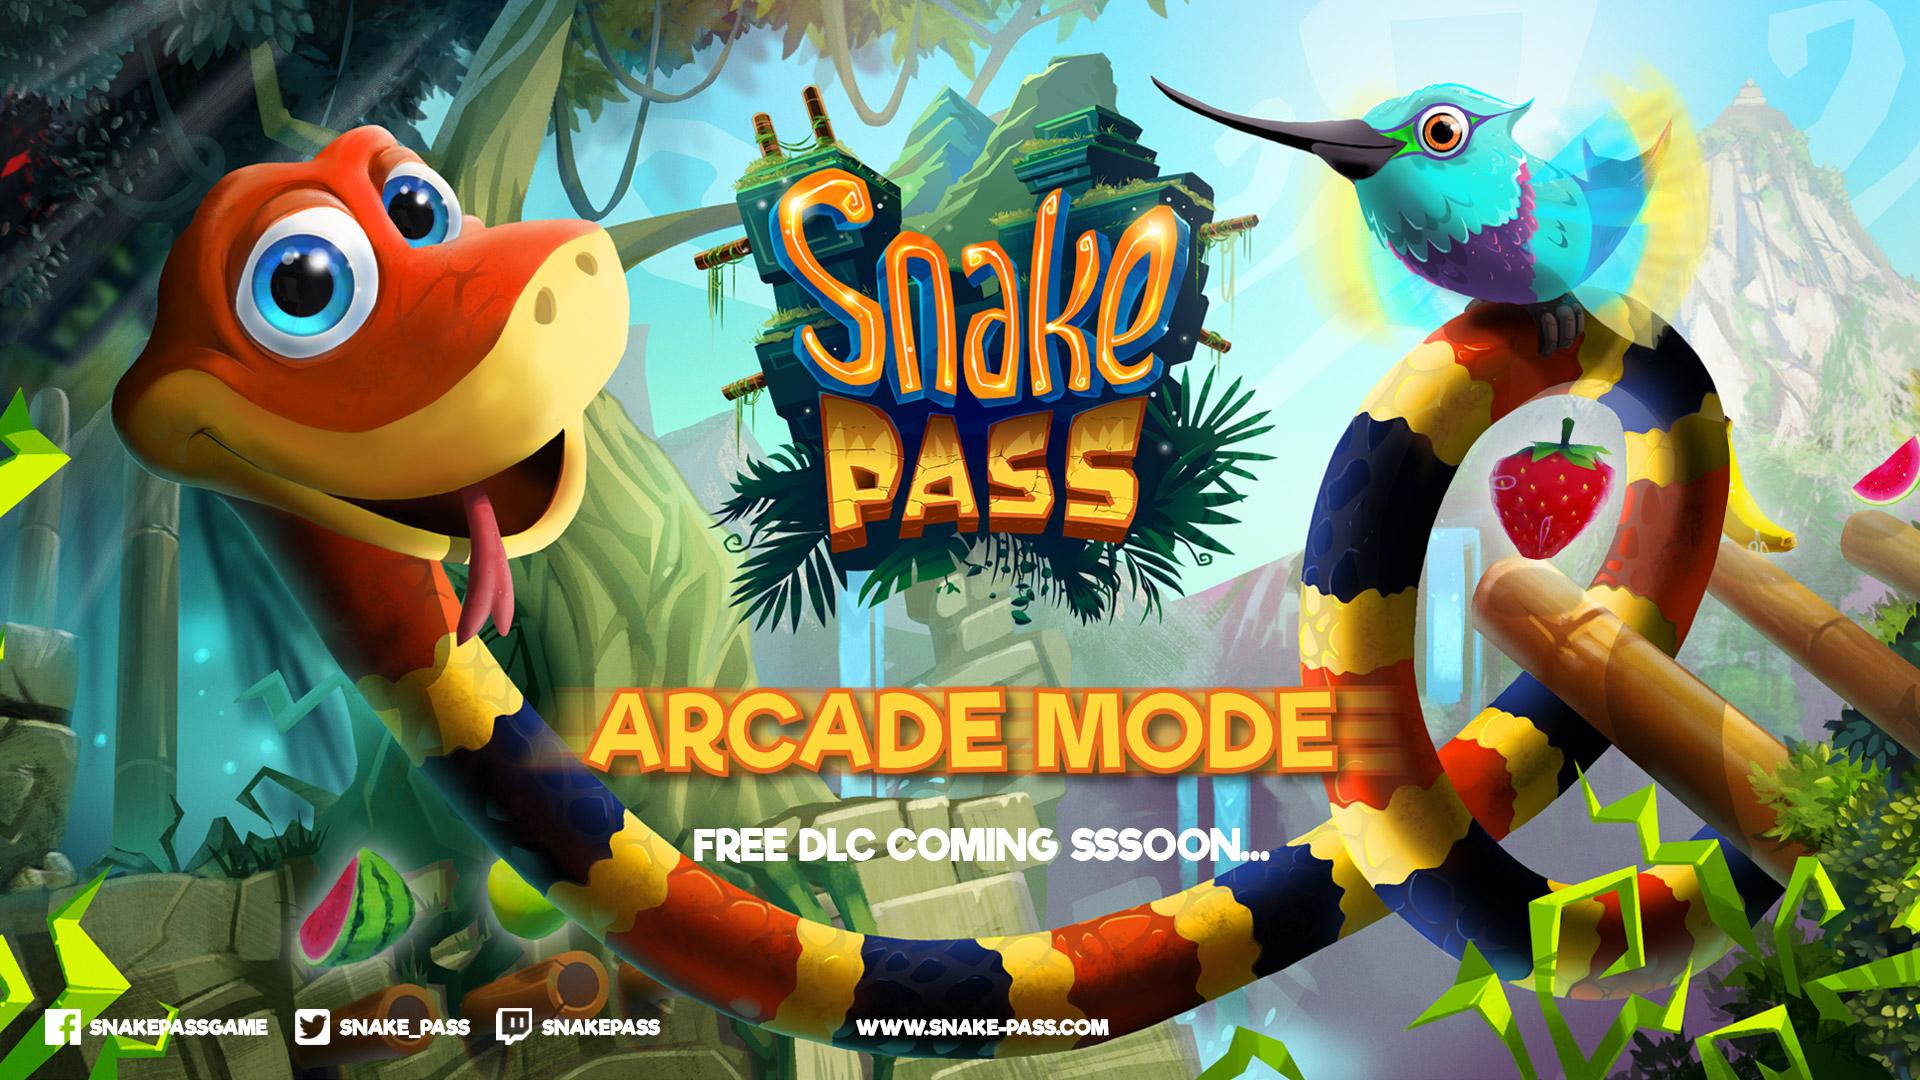 Arcade-mode-generic.jpg